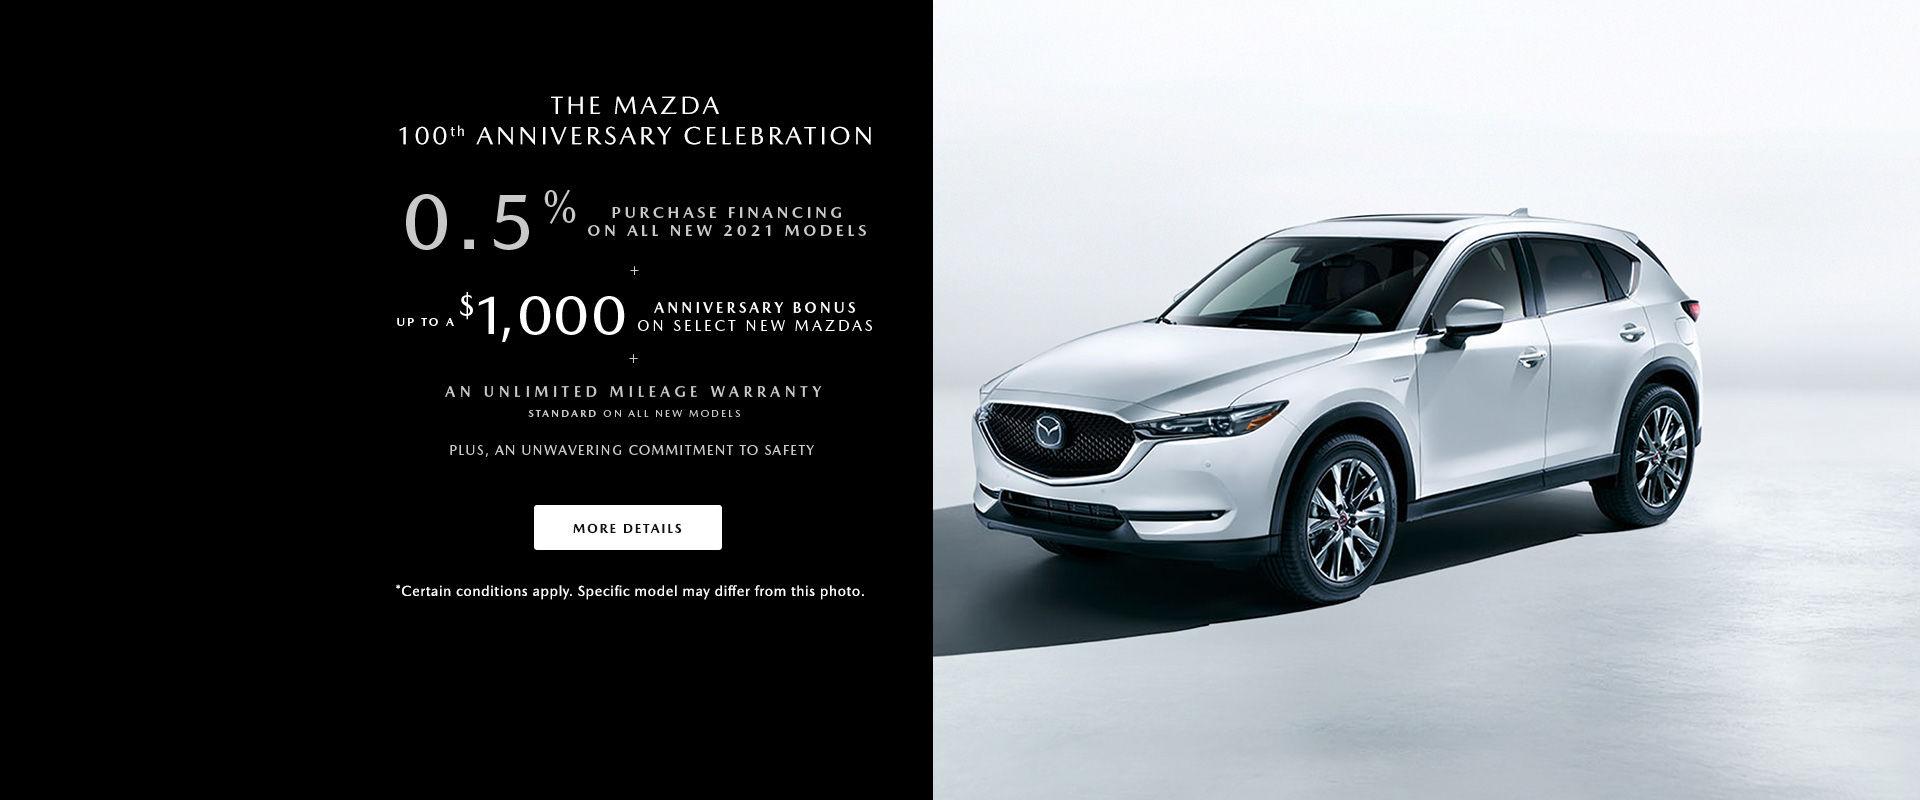 Kekurangan Promo Mazda Tangguh